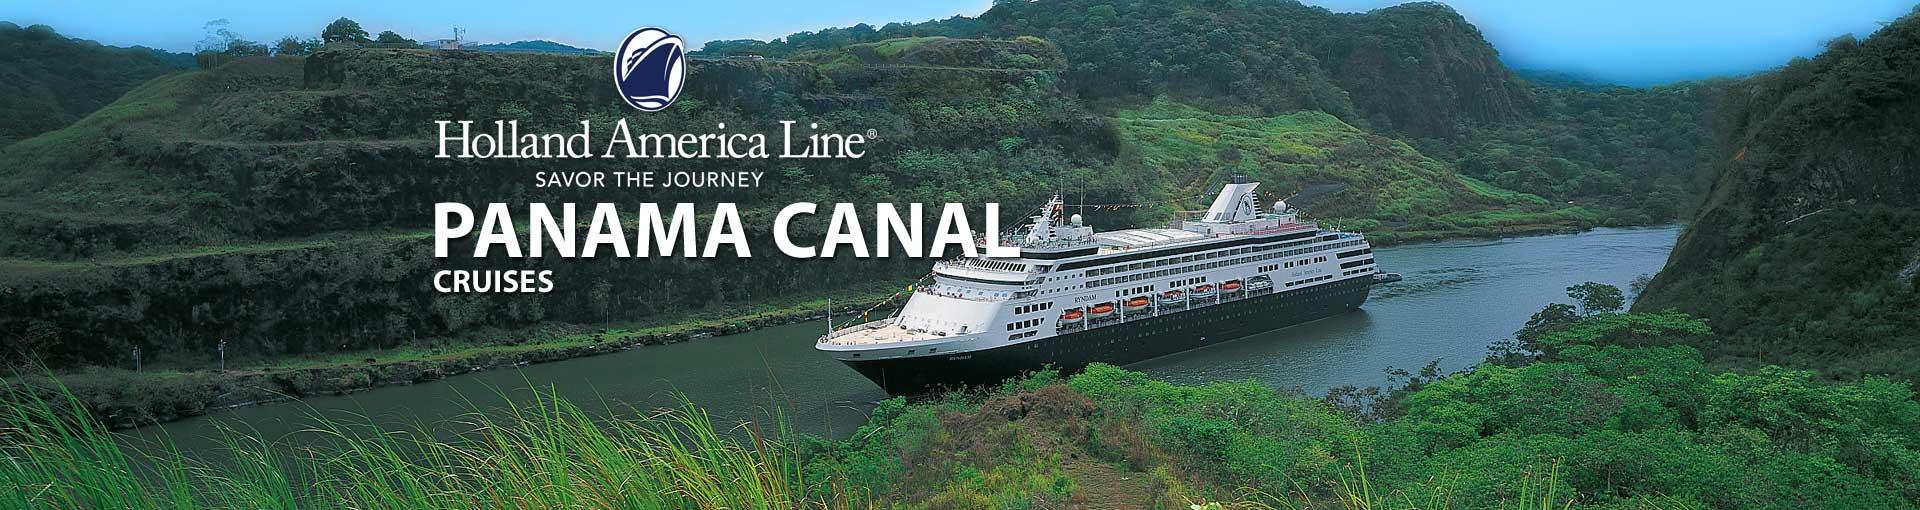 Holland America Panama Canal Cruises